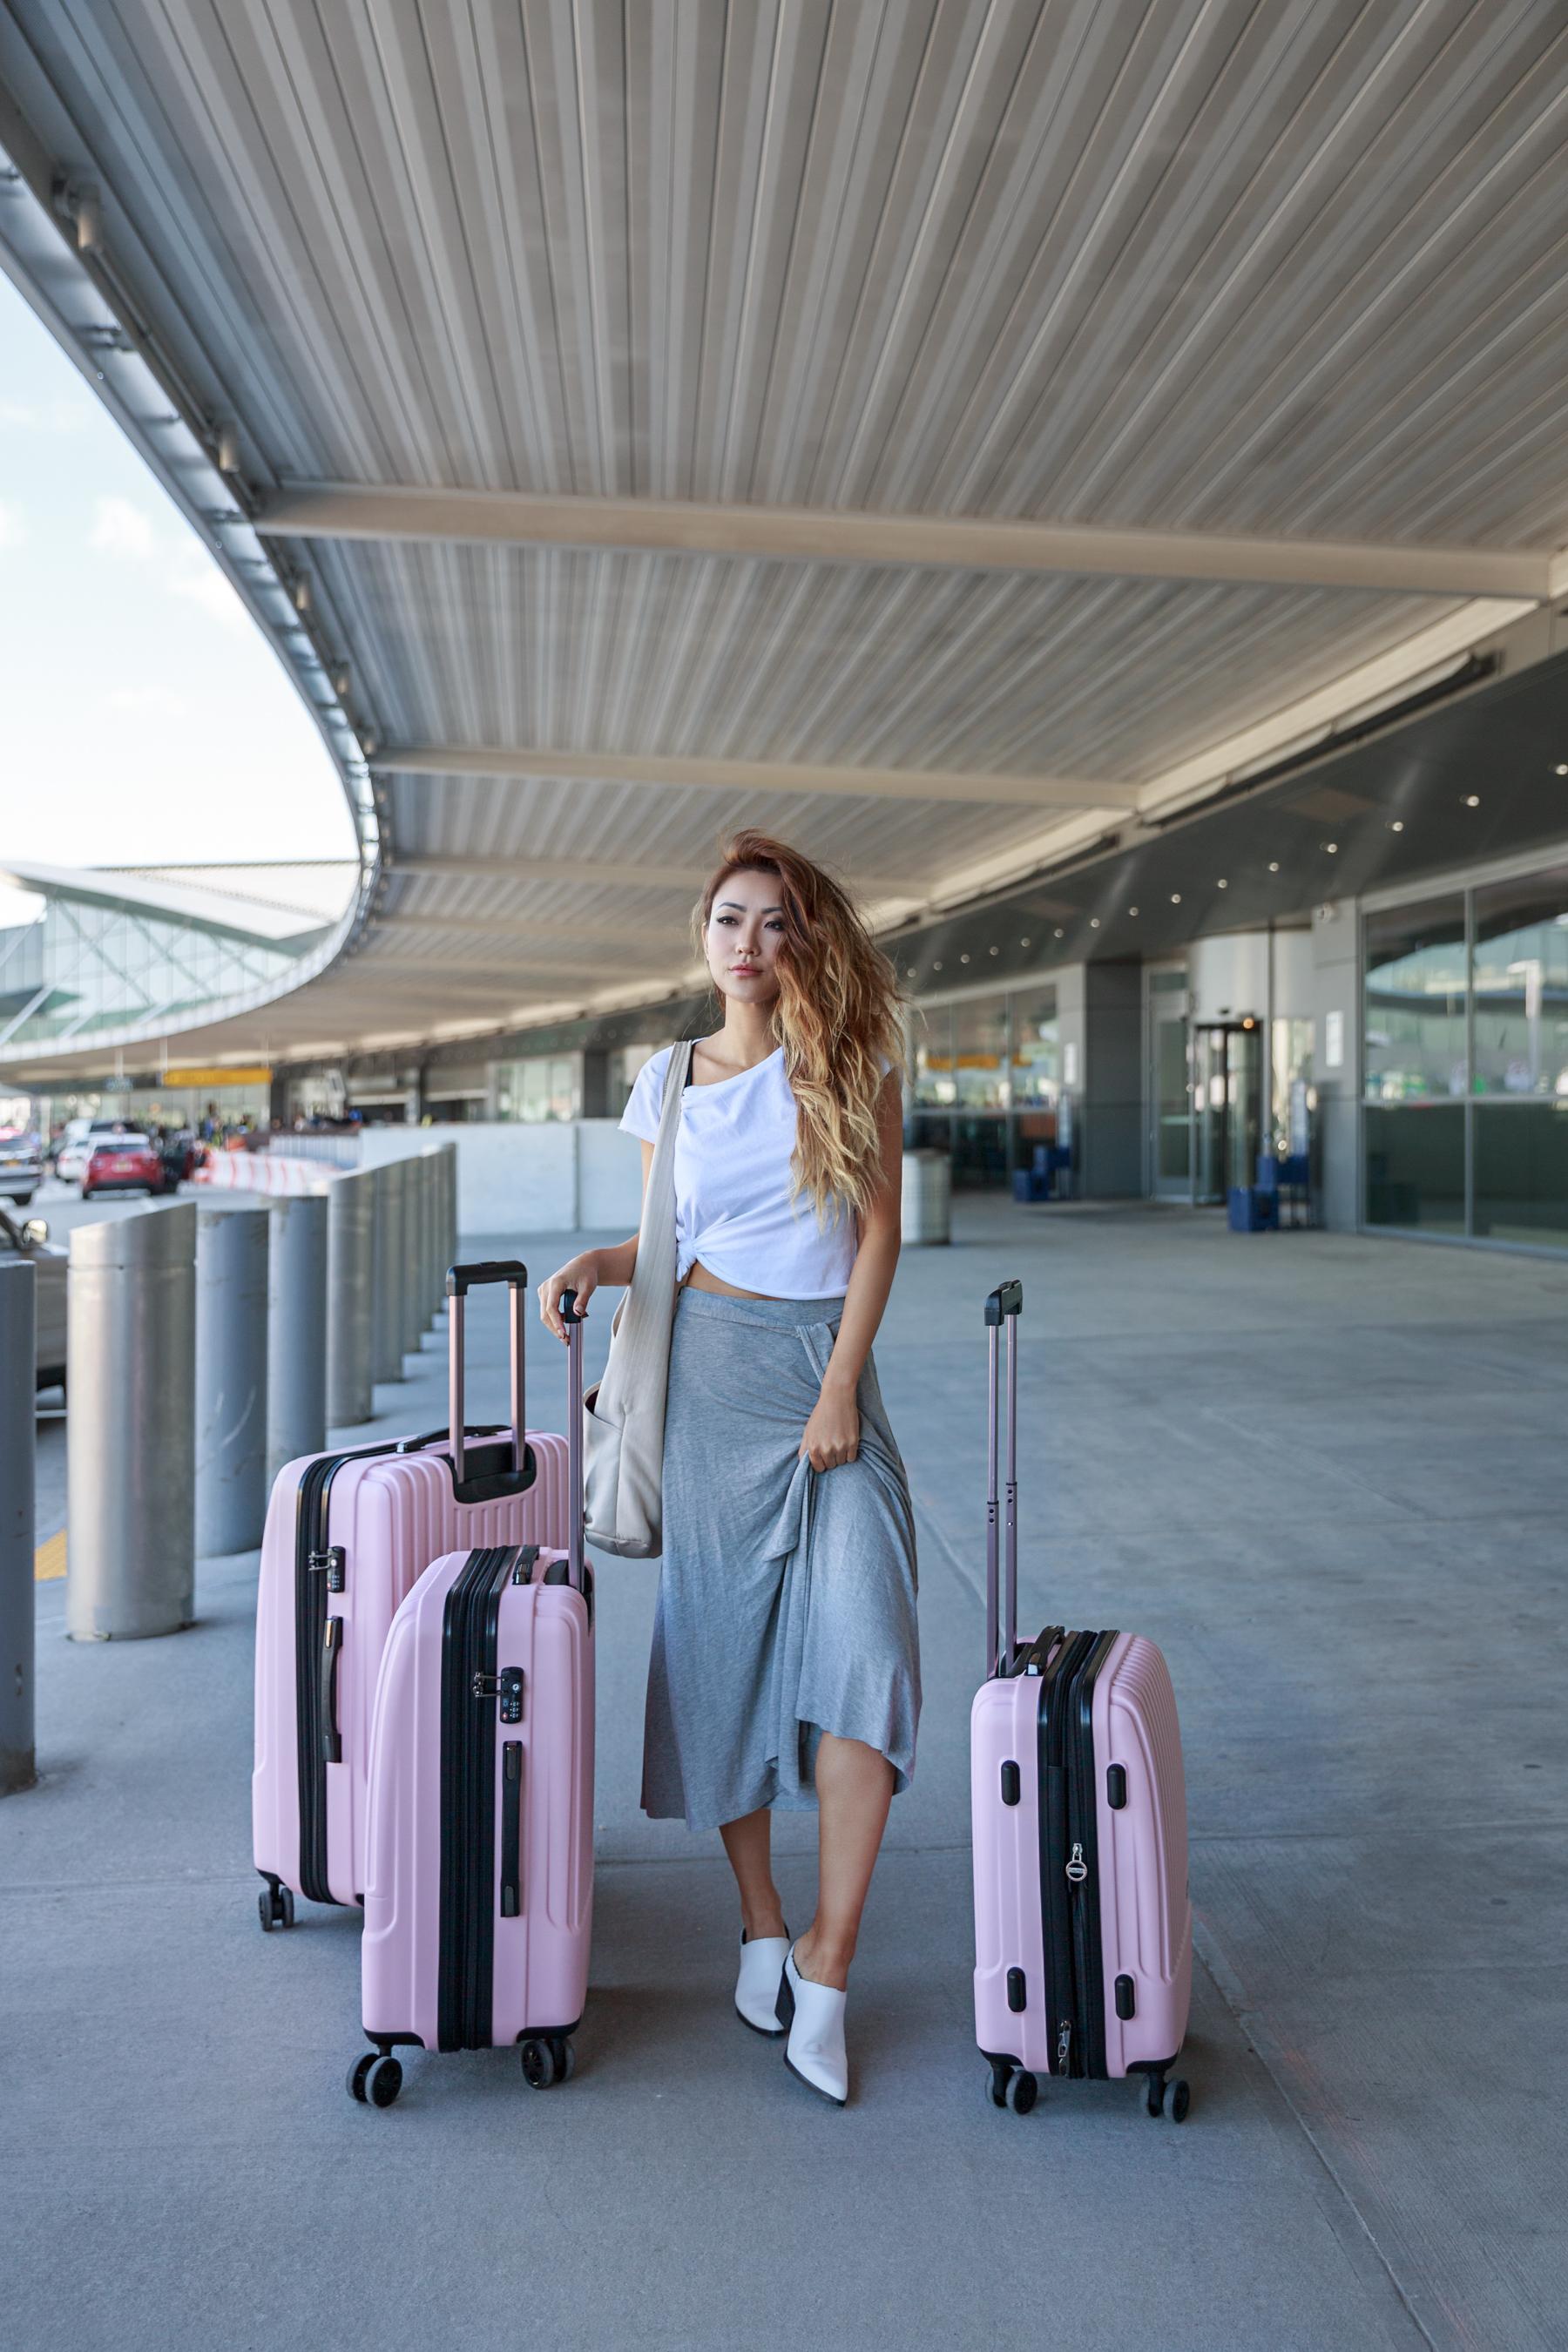 Four Seasons, Las Vegas, Death Valley, NOTJESSFASHION, NYC, Top Fashion Blogger, Lifestyle Blogger, Travel Blogger